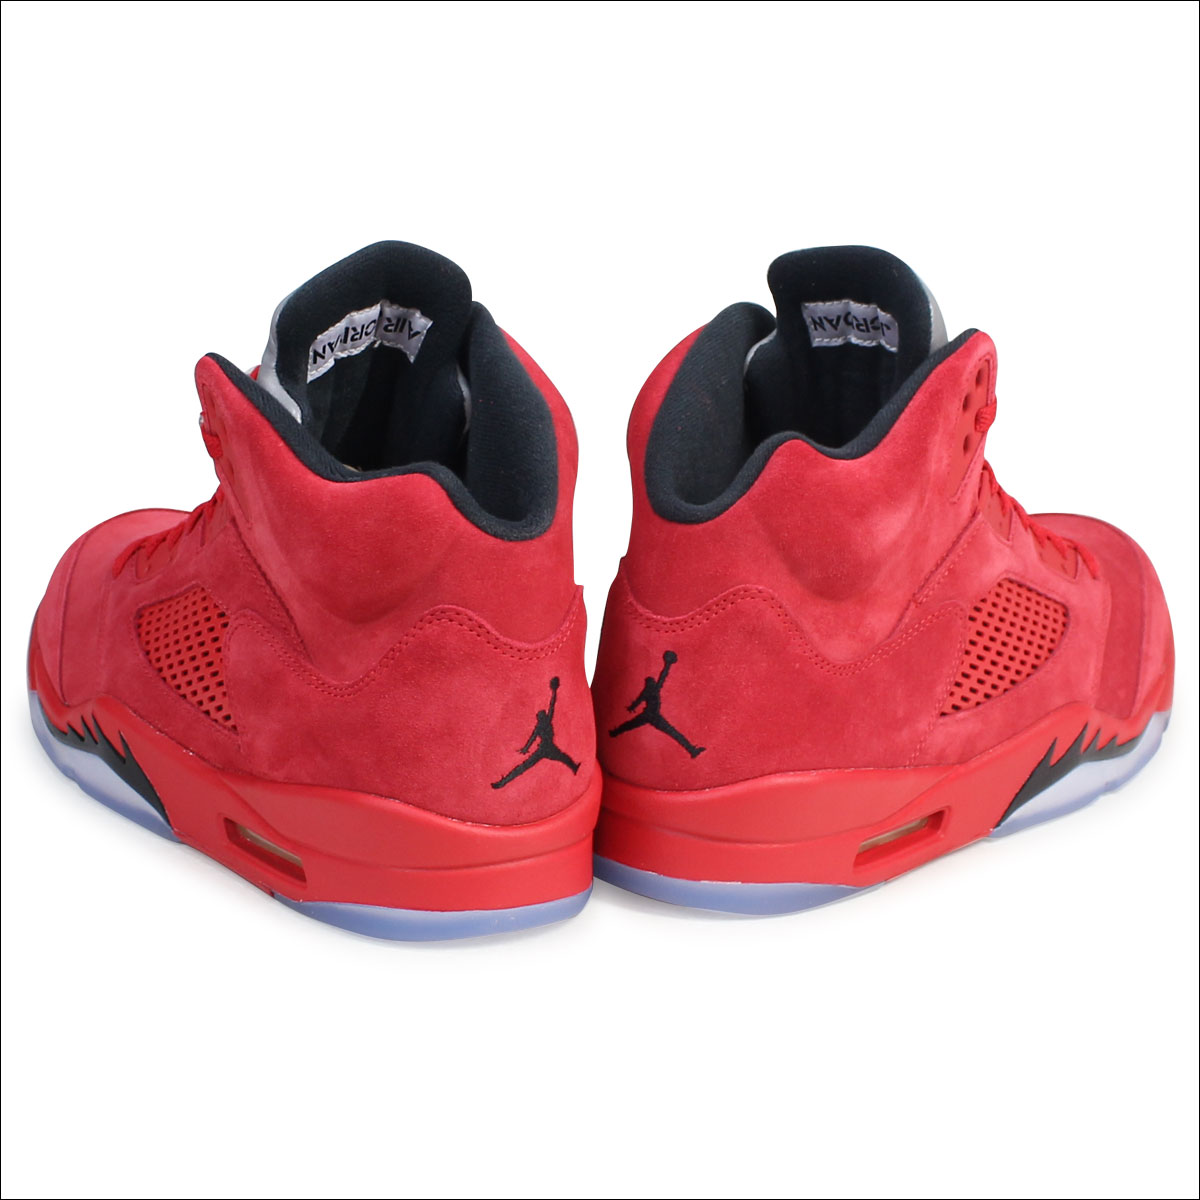 04b85c5bde708c Nike NIKE Air Jordan 5 nostalgic sneakers AIR JORDAN 5 RETRO UNIVERSITY  136